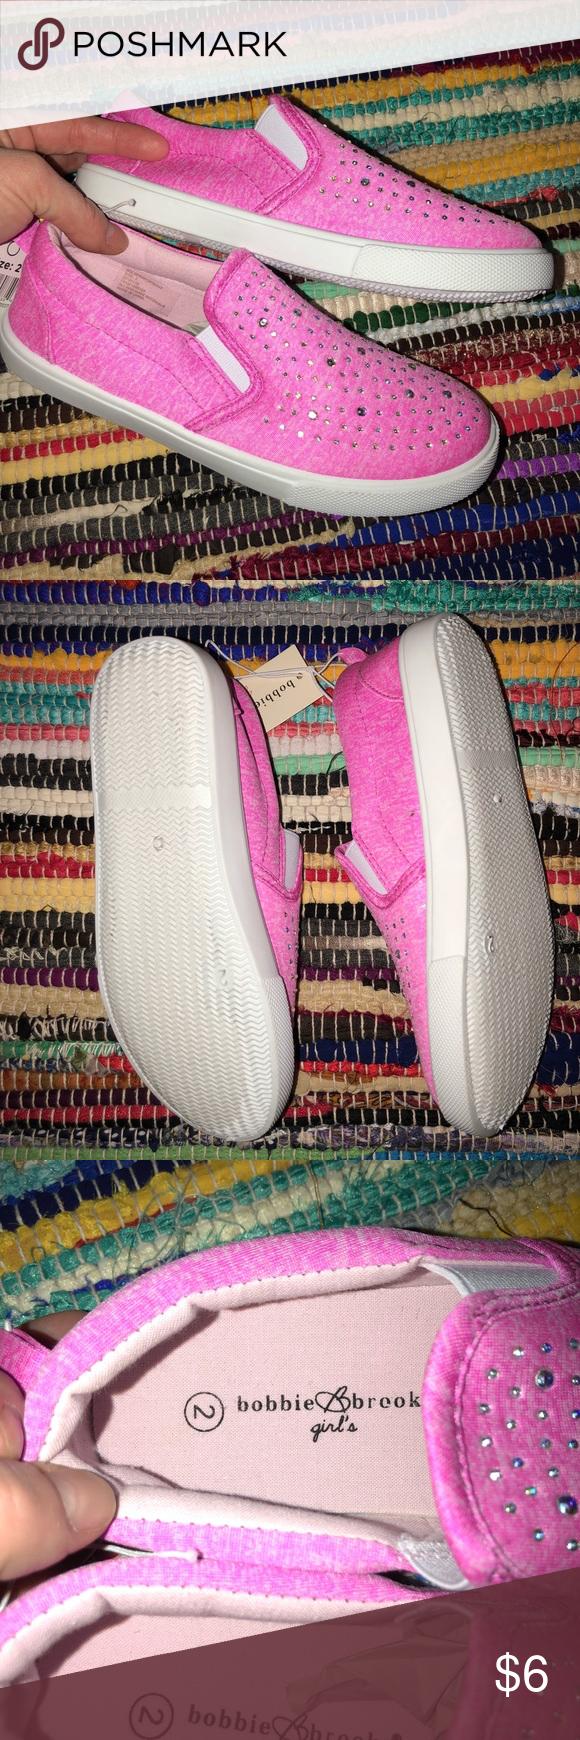 f83754af22a 👧🏼💕NWT💟Bobbie Brooks Girls pink shoe💕👧🏼 NWT!! Rhinestones on shoes!  Size 2